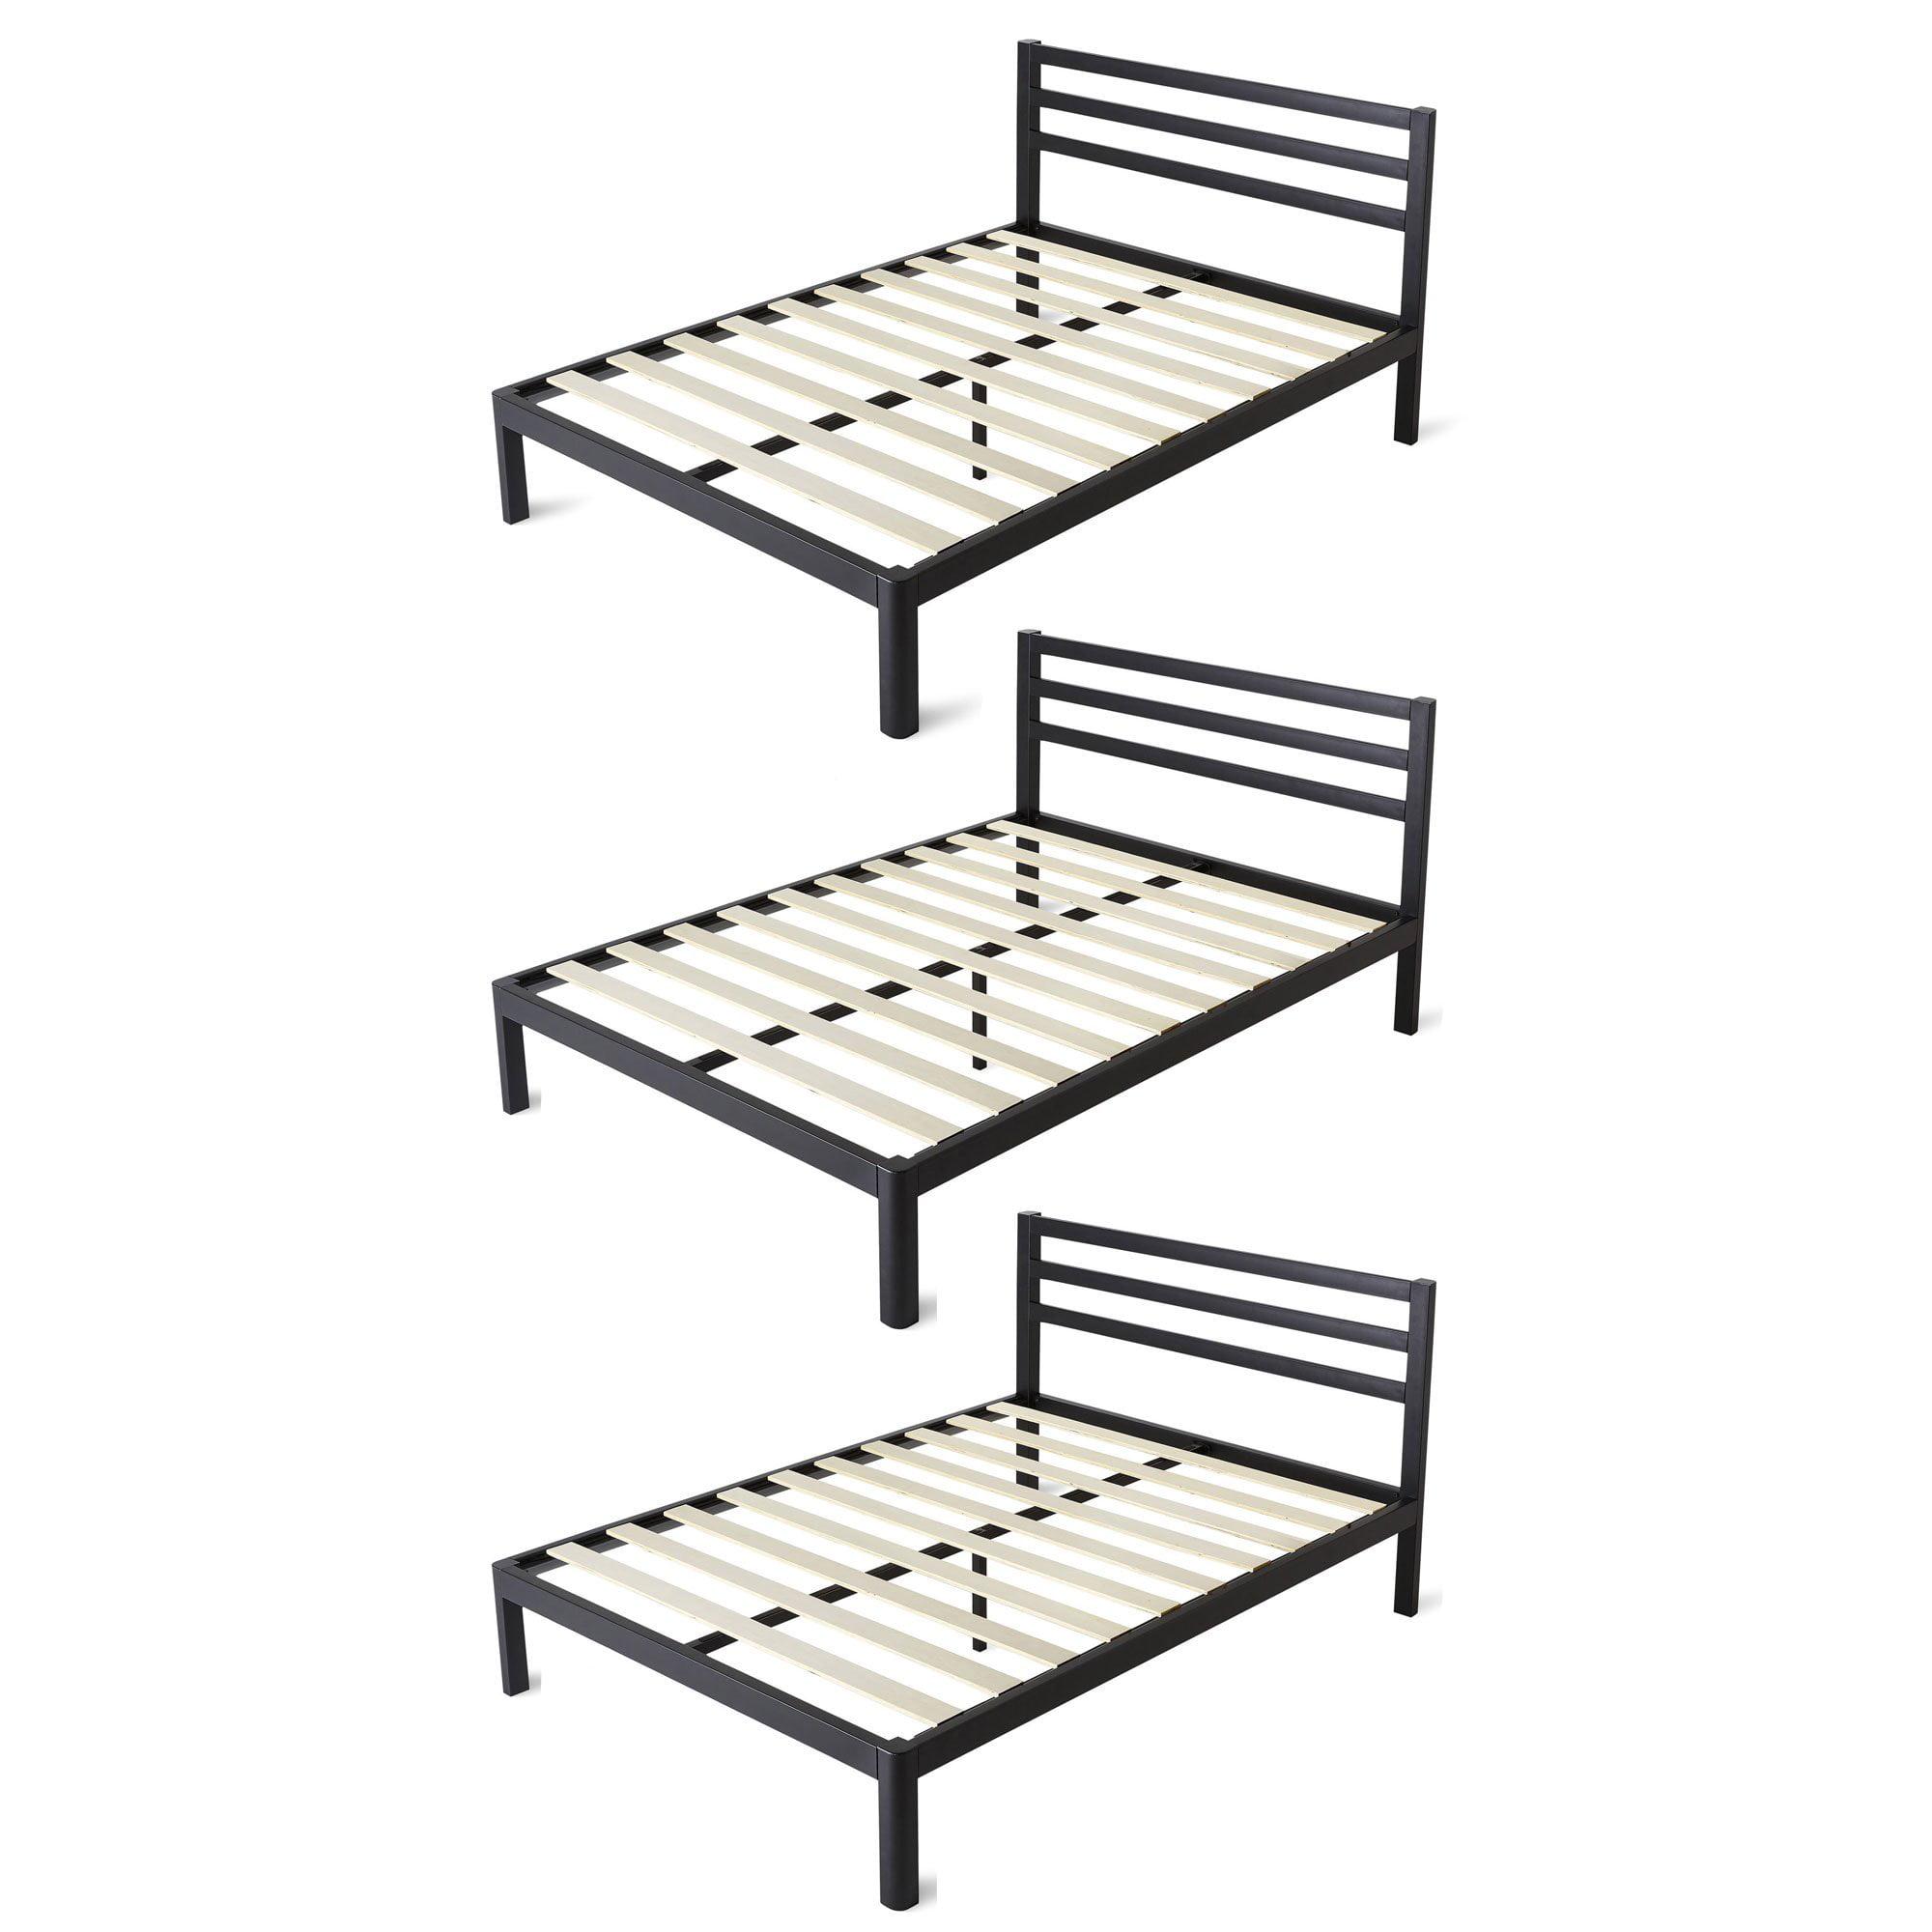 intelliBASE Twin Size Wooden Slat Platform Bed Frame with Headboard (3 Pack)